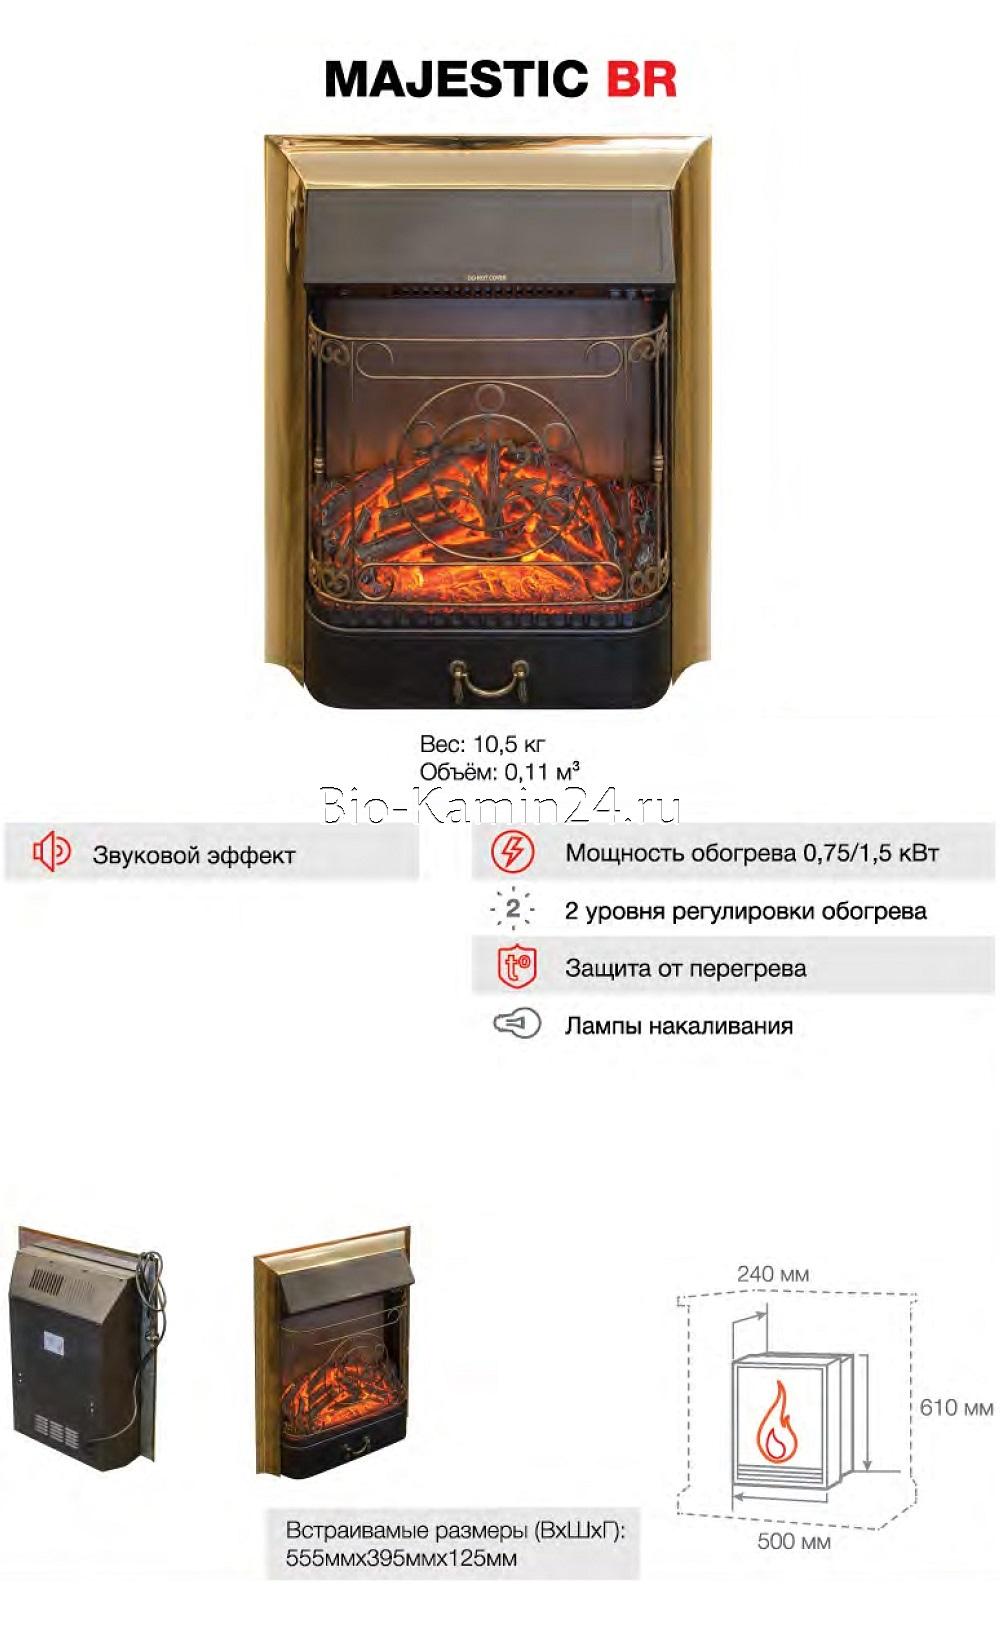 http://bio-kamin24.ru/images/upload/magestic%20brass.jpg